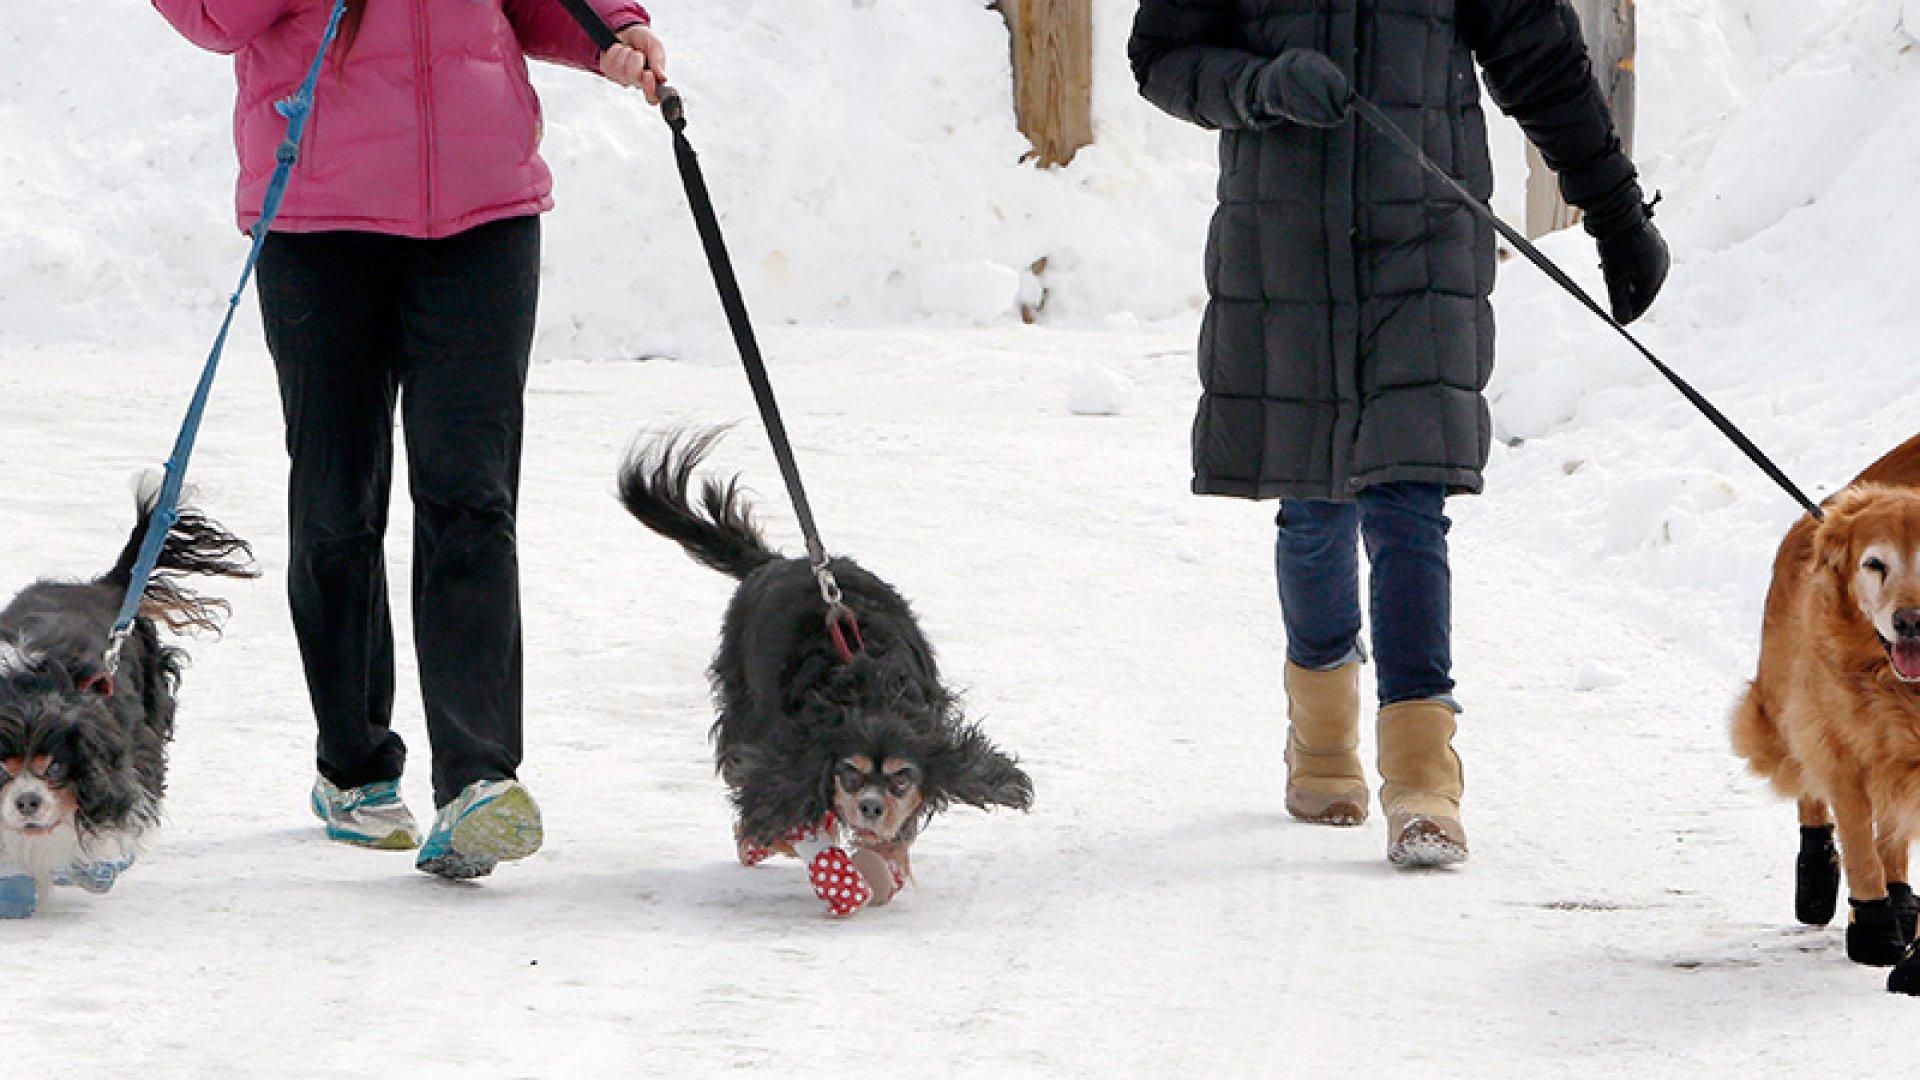 Dog Boot Company Makes a Killing Amid Bone-Chilling Winter